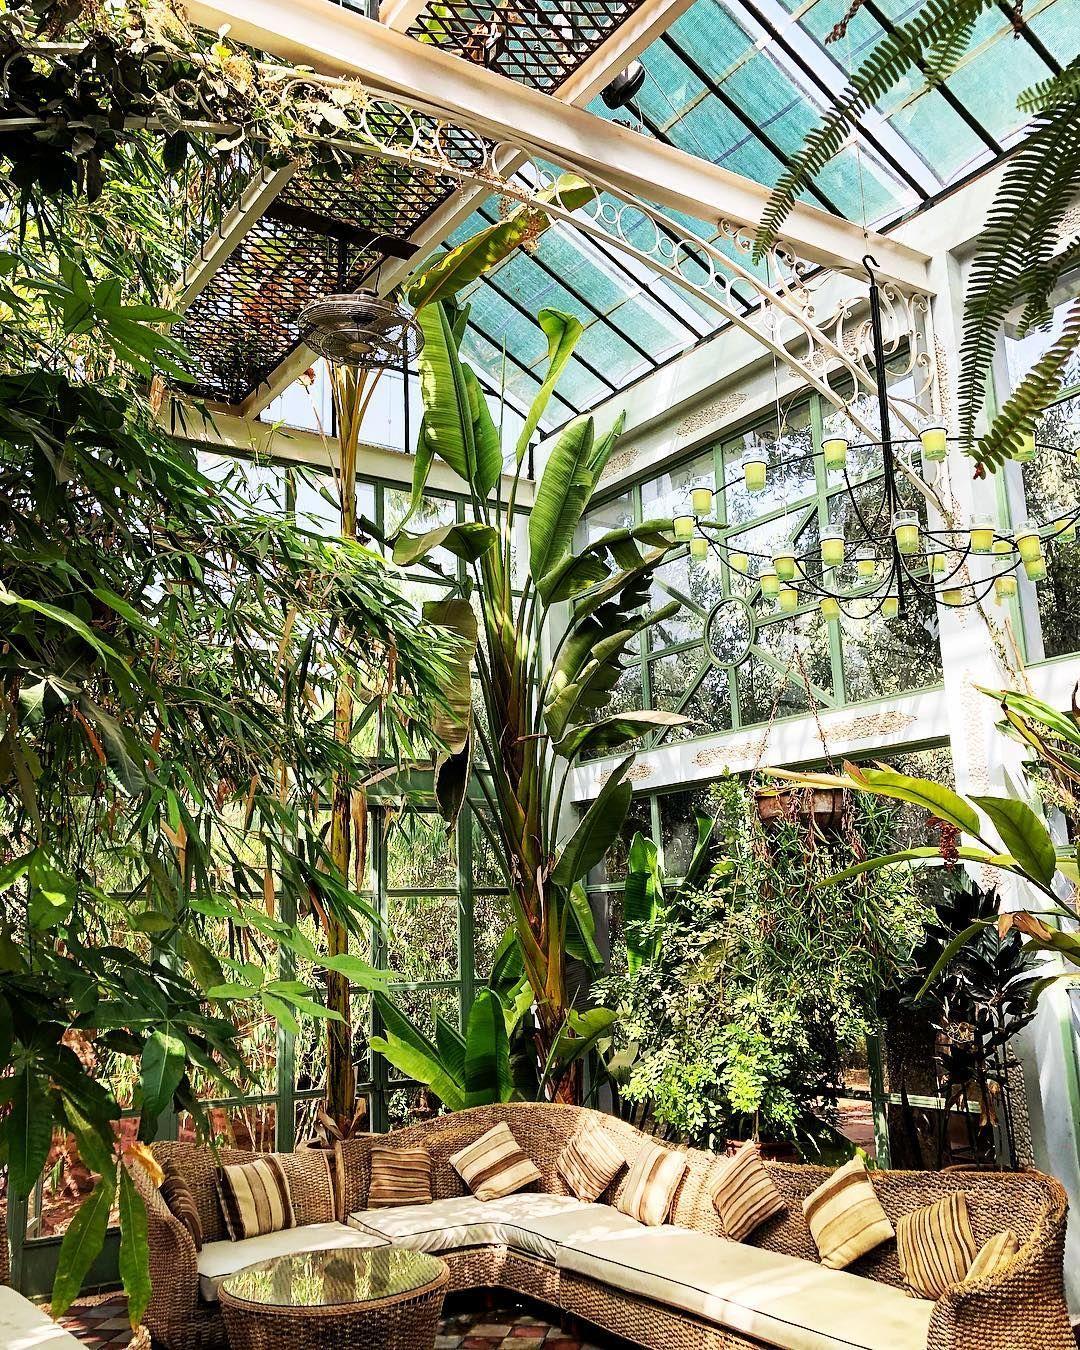 Beldi Country Club Marrakech On Instagram Jungle Greenhouse Beldicountryclub Bybeldi Beldicountryclub By In 2020 Greenhouse Cafe Cafe House Greenhouse Kitchen